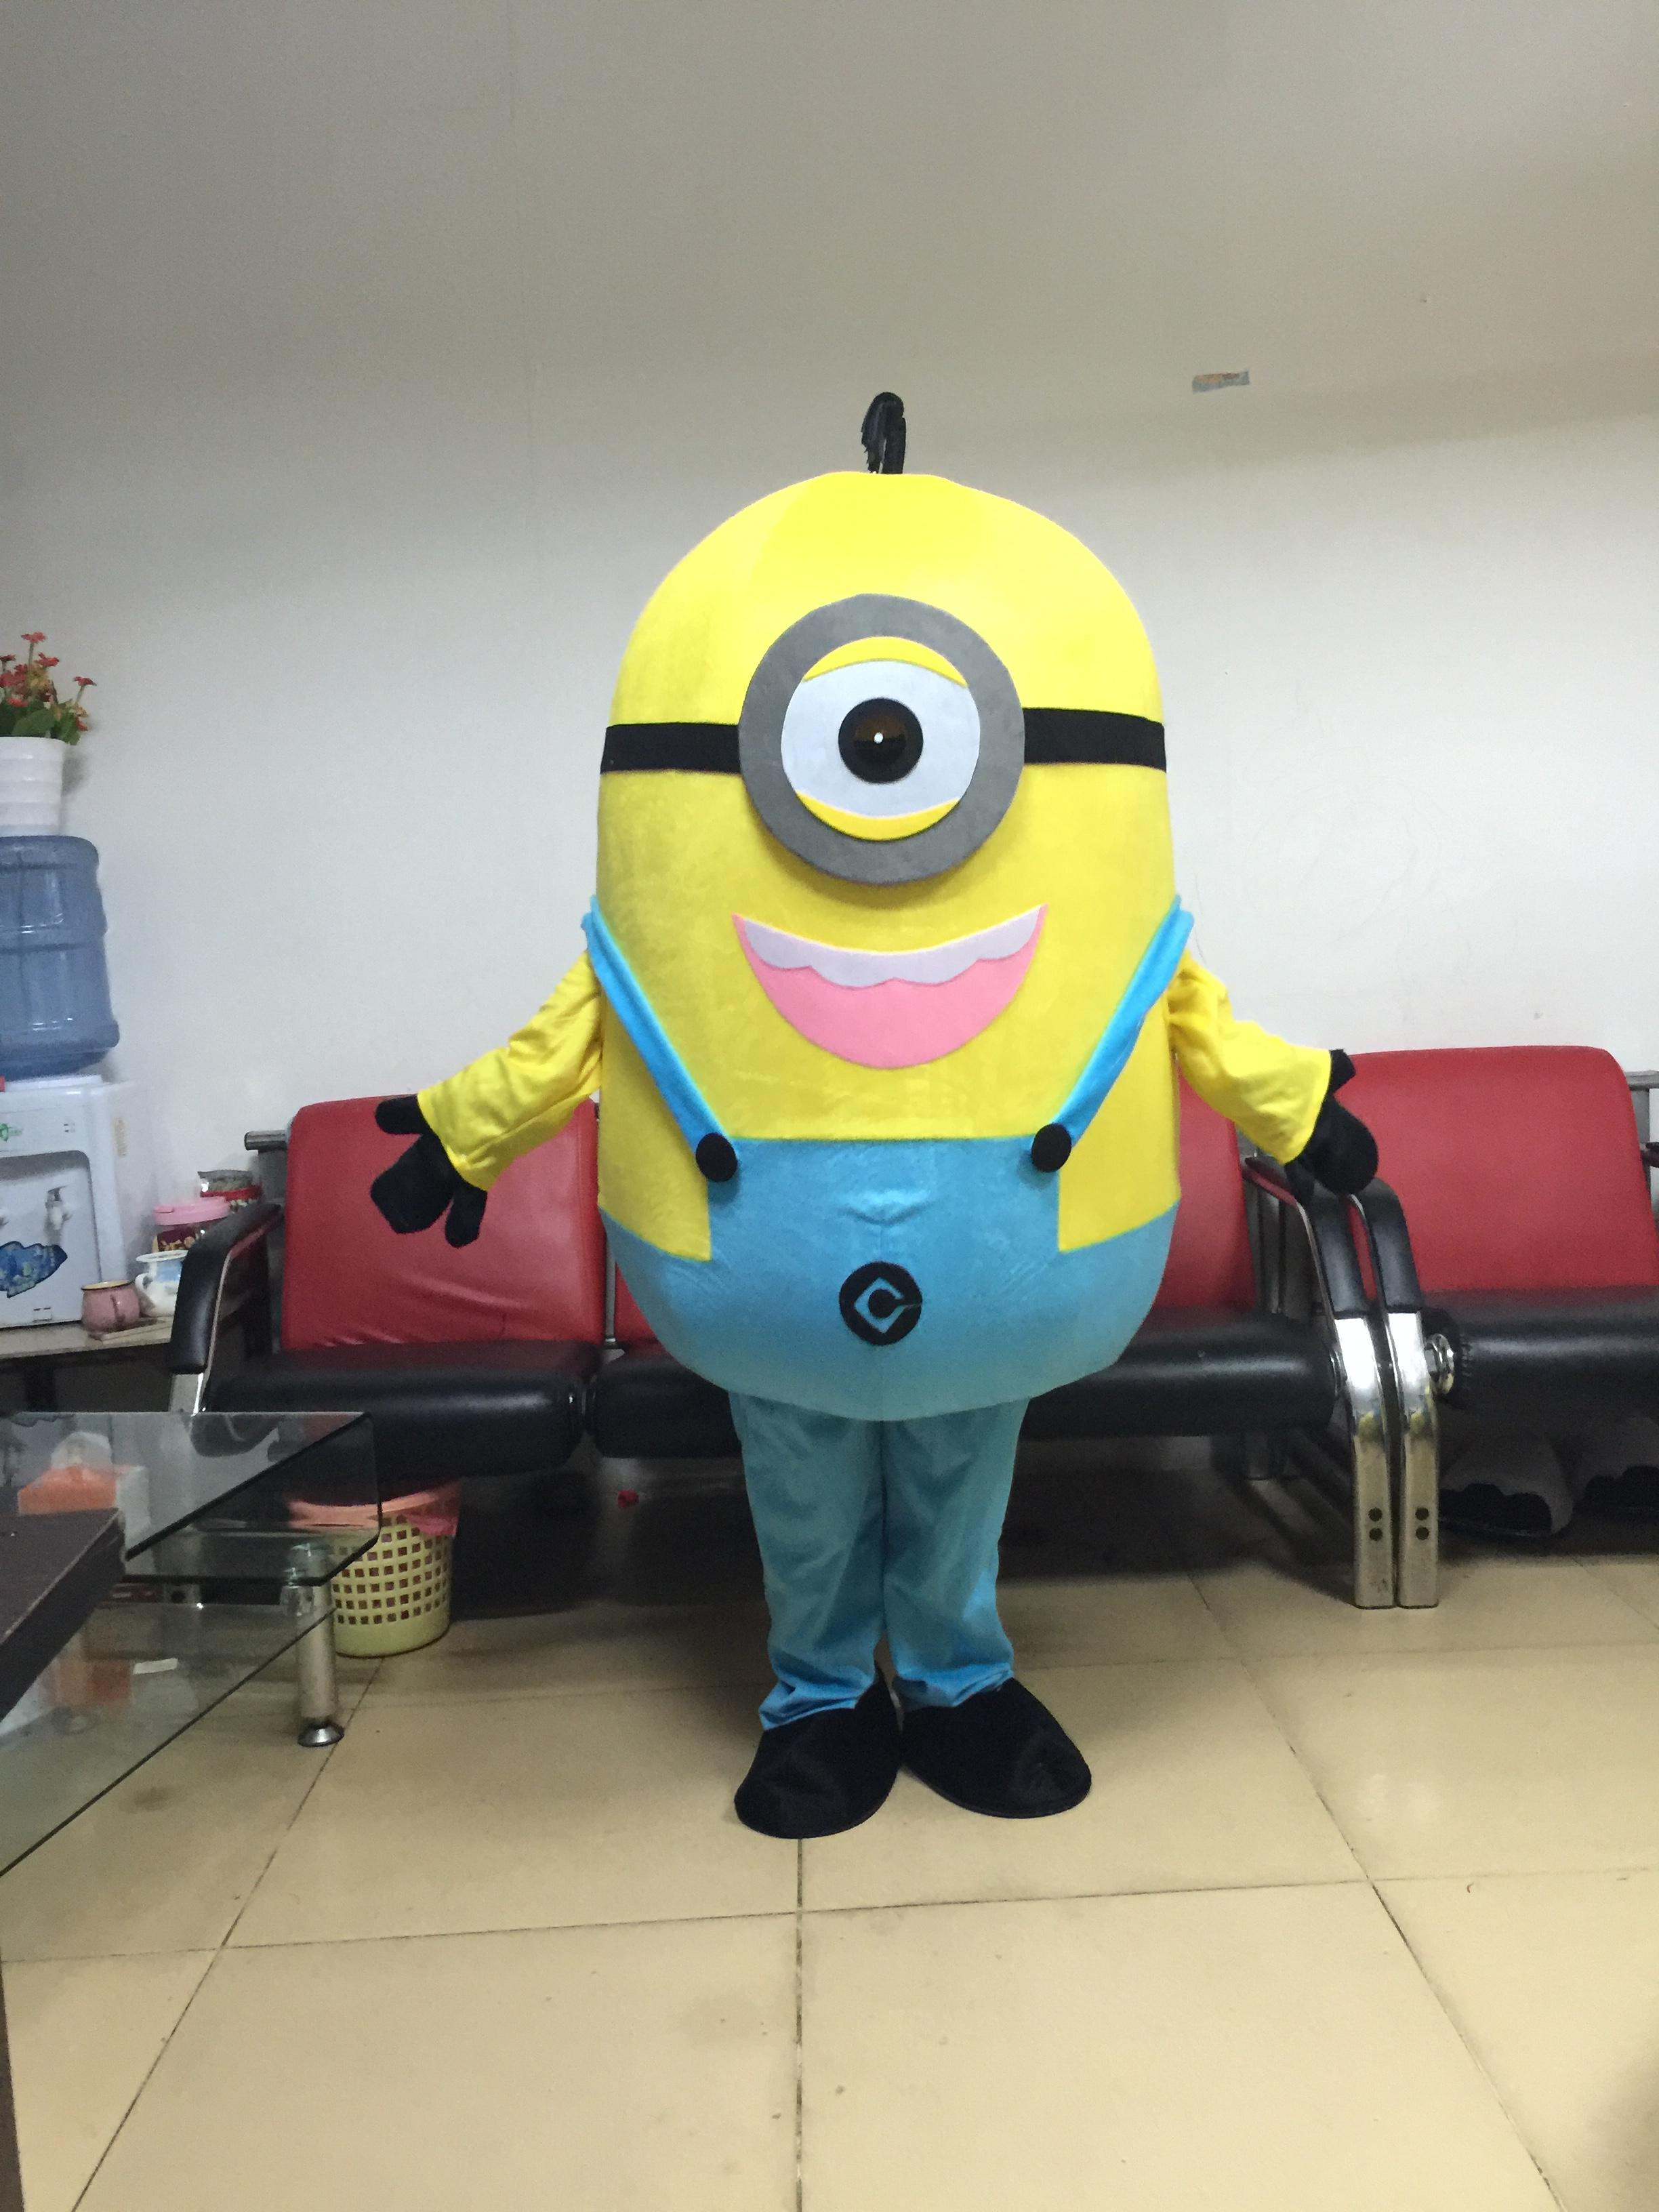 Hot Selling One Eye Minions Mascot Costume Halloween Costume Rentals Sports  Mascots From Gzjieyouqi, $106.6| DHgate.Com